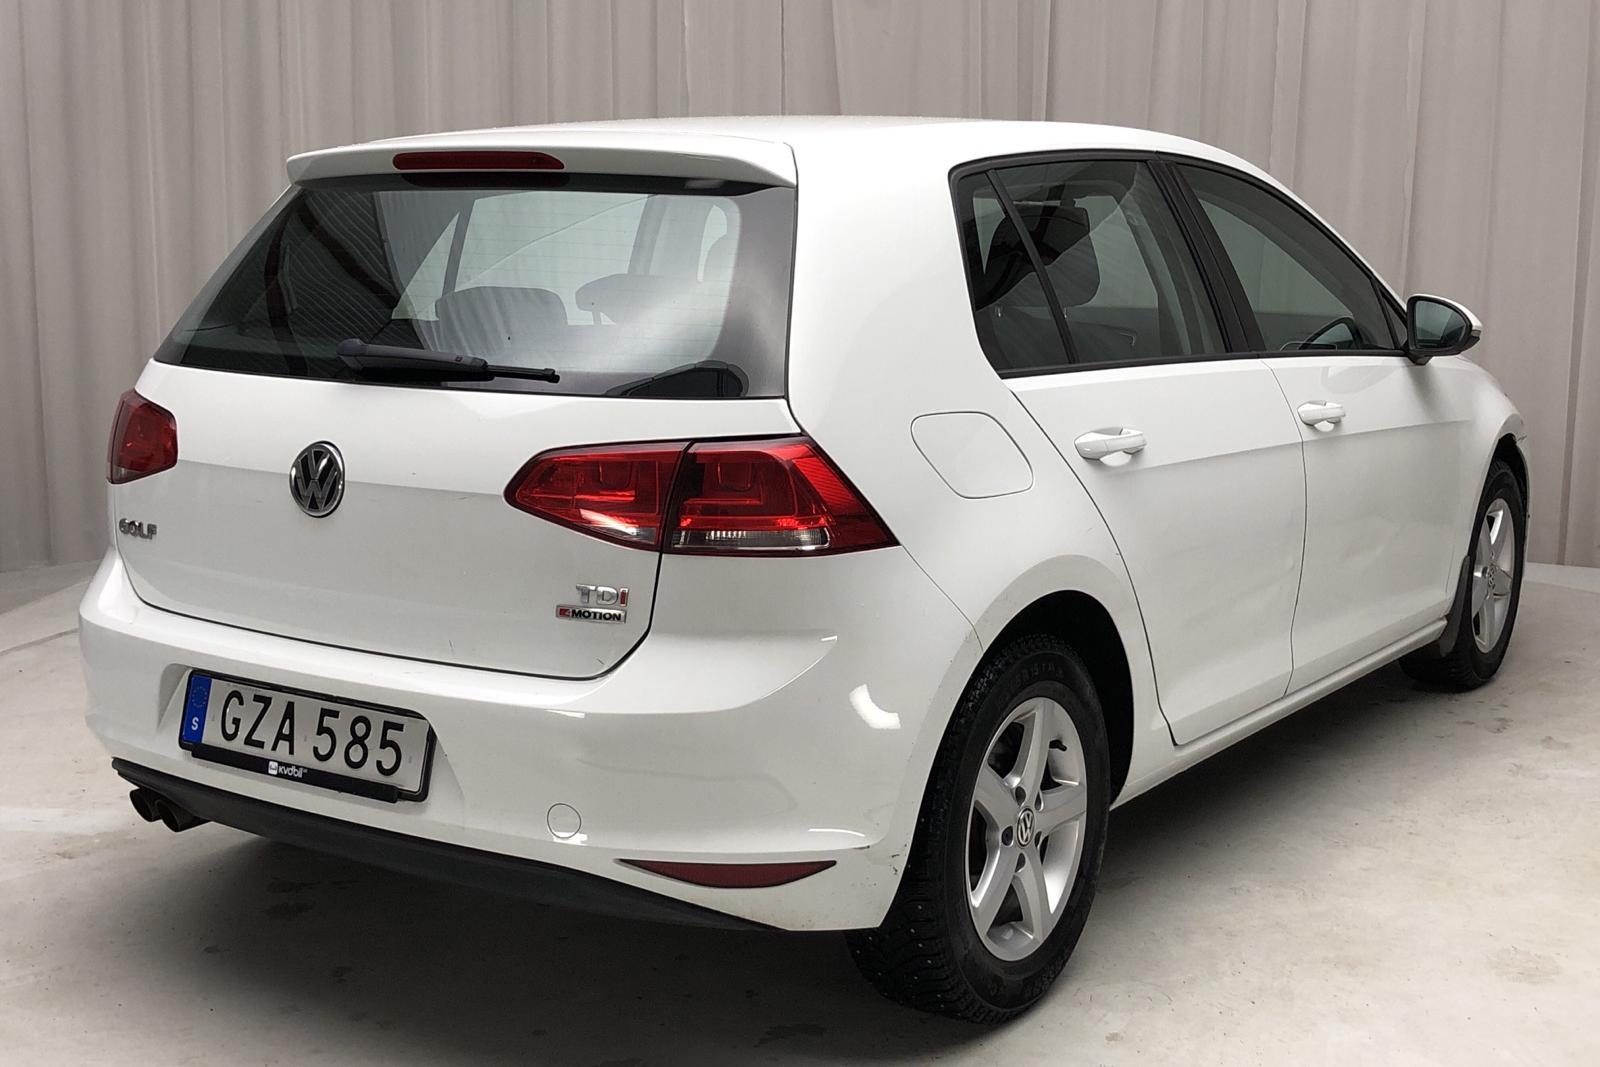 VW Golf VII 1.6 TDI BlueMotion 5dr 4Motion (110hk) - 111 840 km - Manual - white - 2016